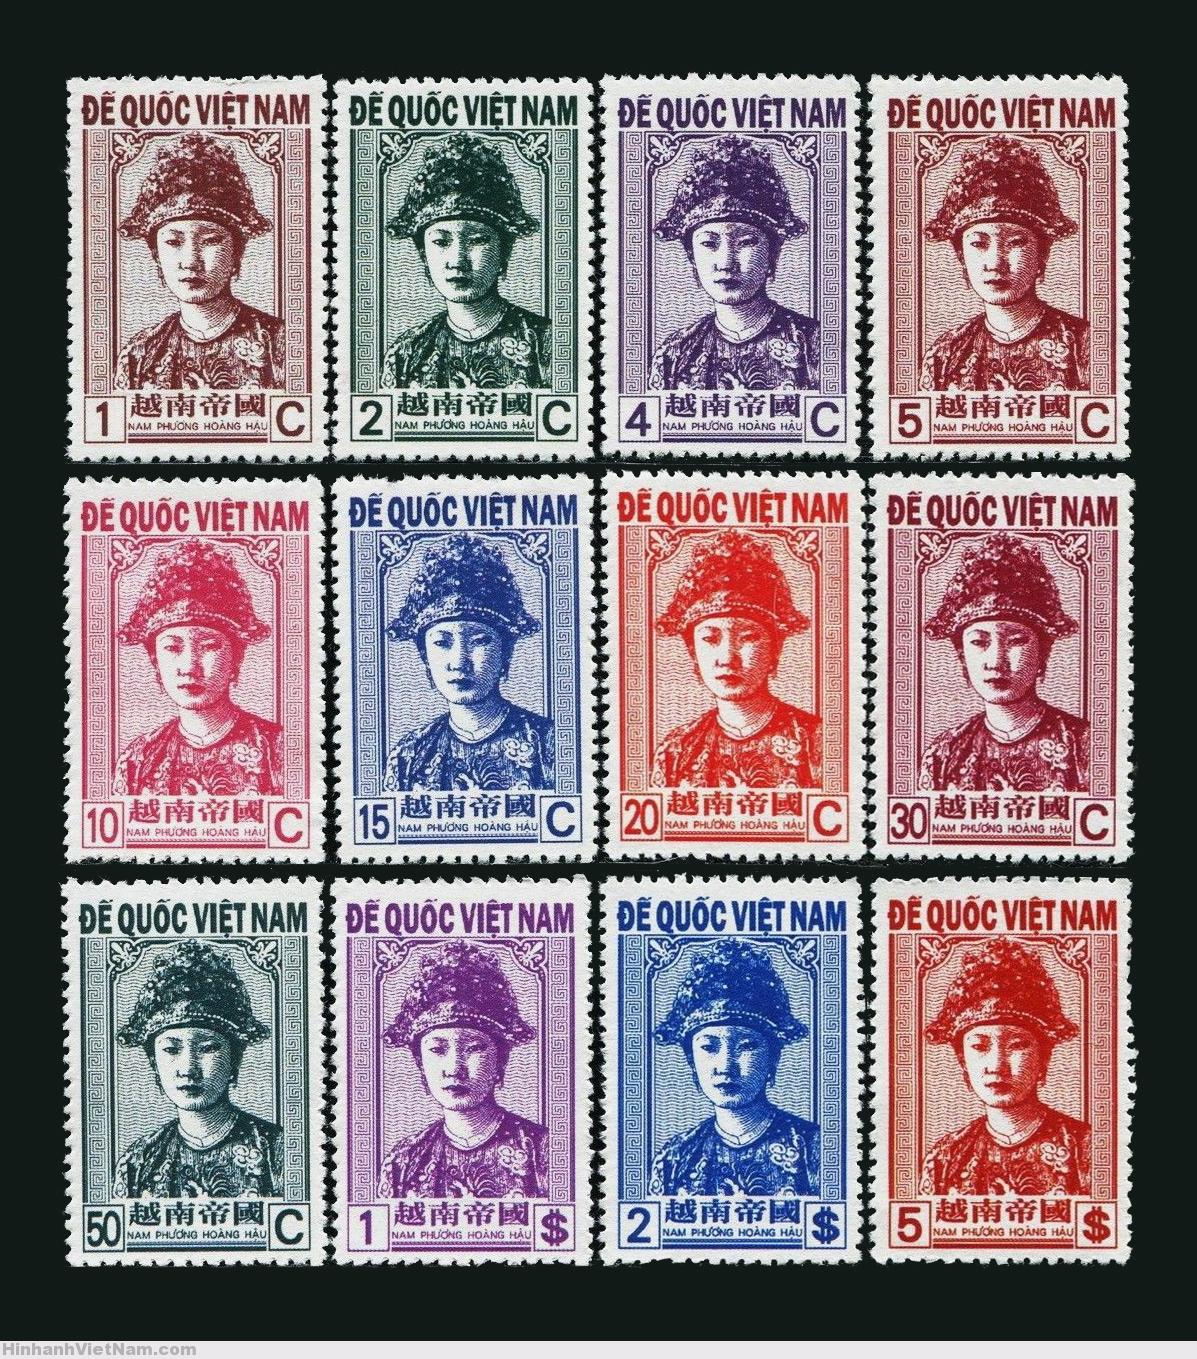 12 Empire of Vietnam 1945 Unissued Empress Nam Phuong Stamp Set